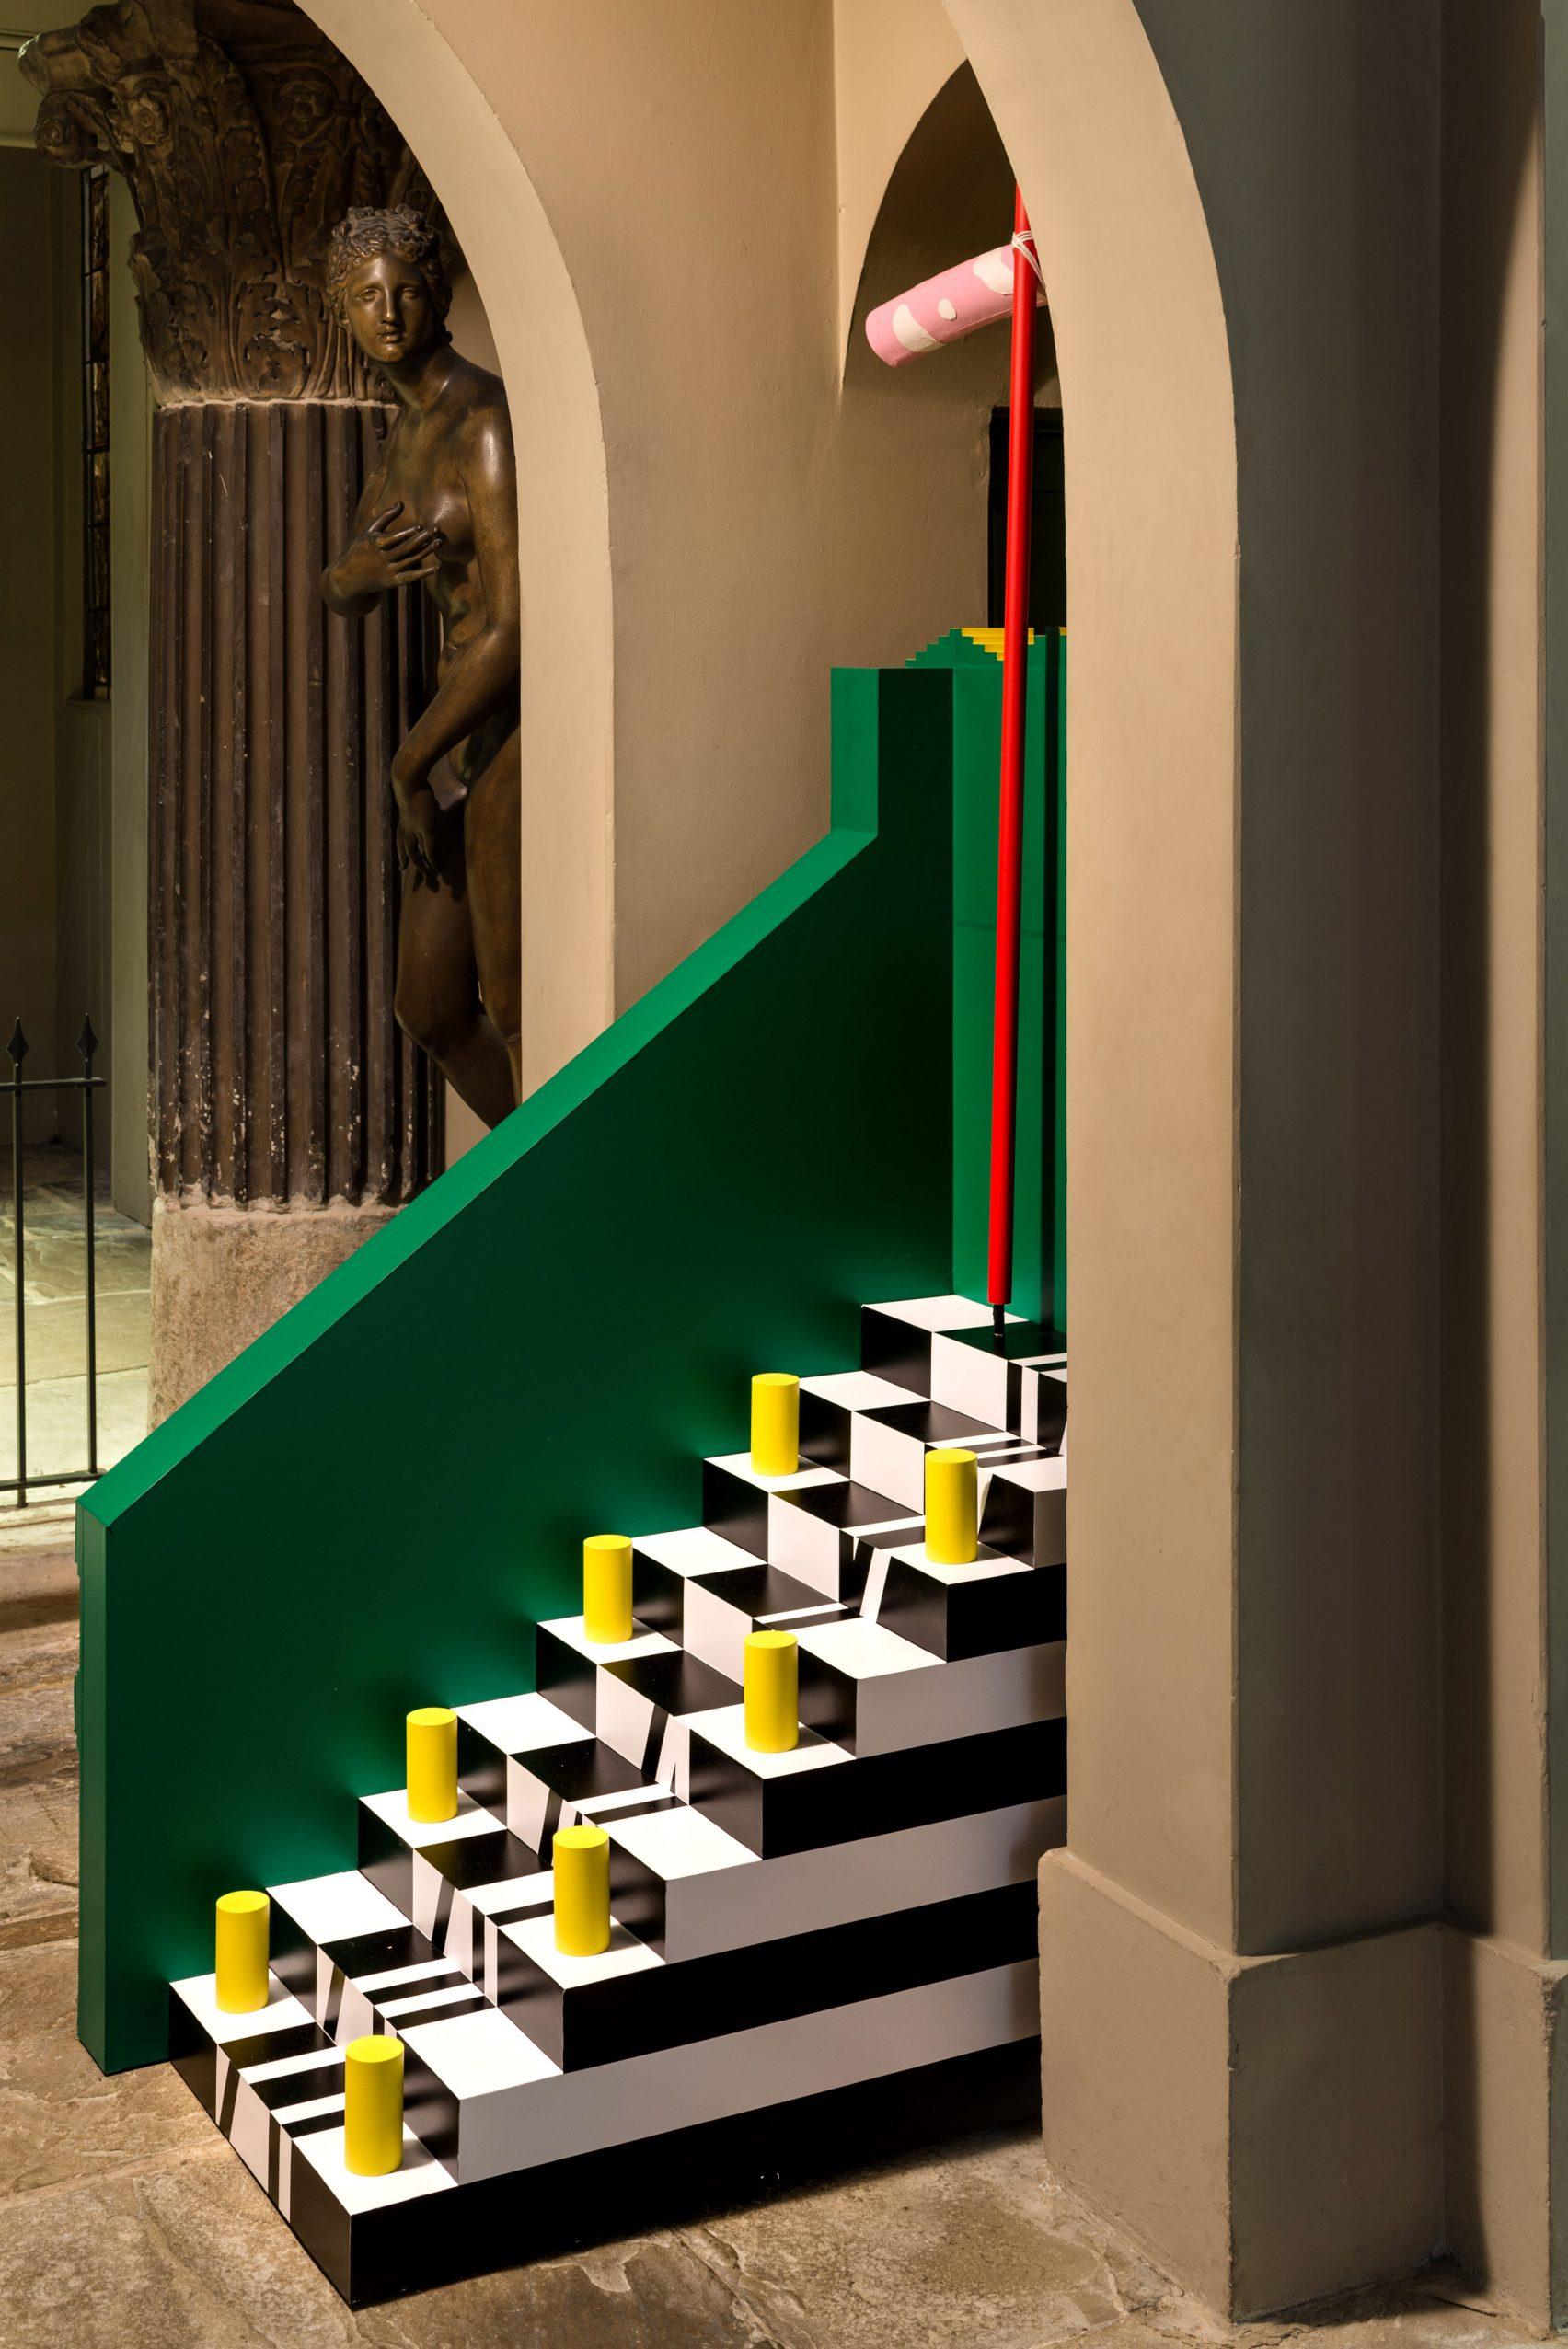 john-soane-architectural-characters-installation-london-uk_dezeen_2364_col_3-1704x2553.jpg